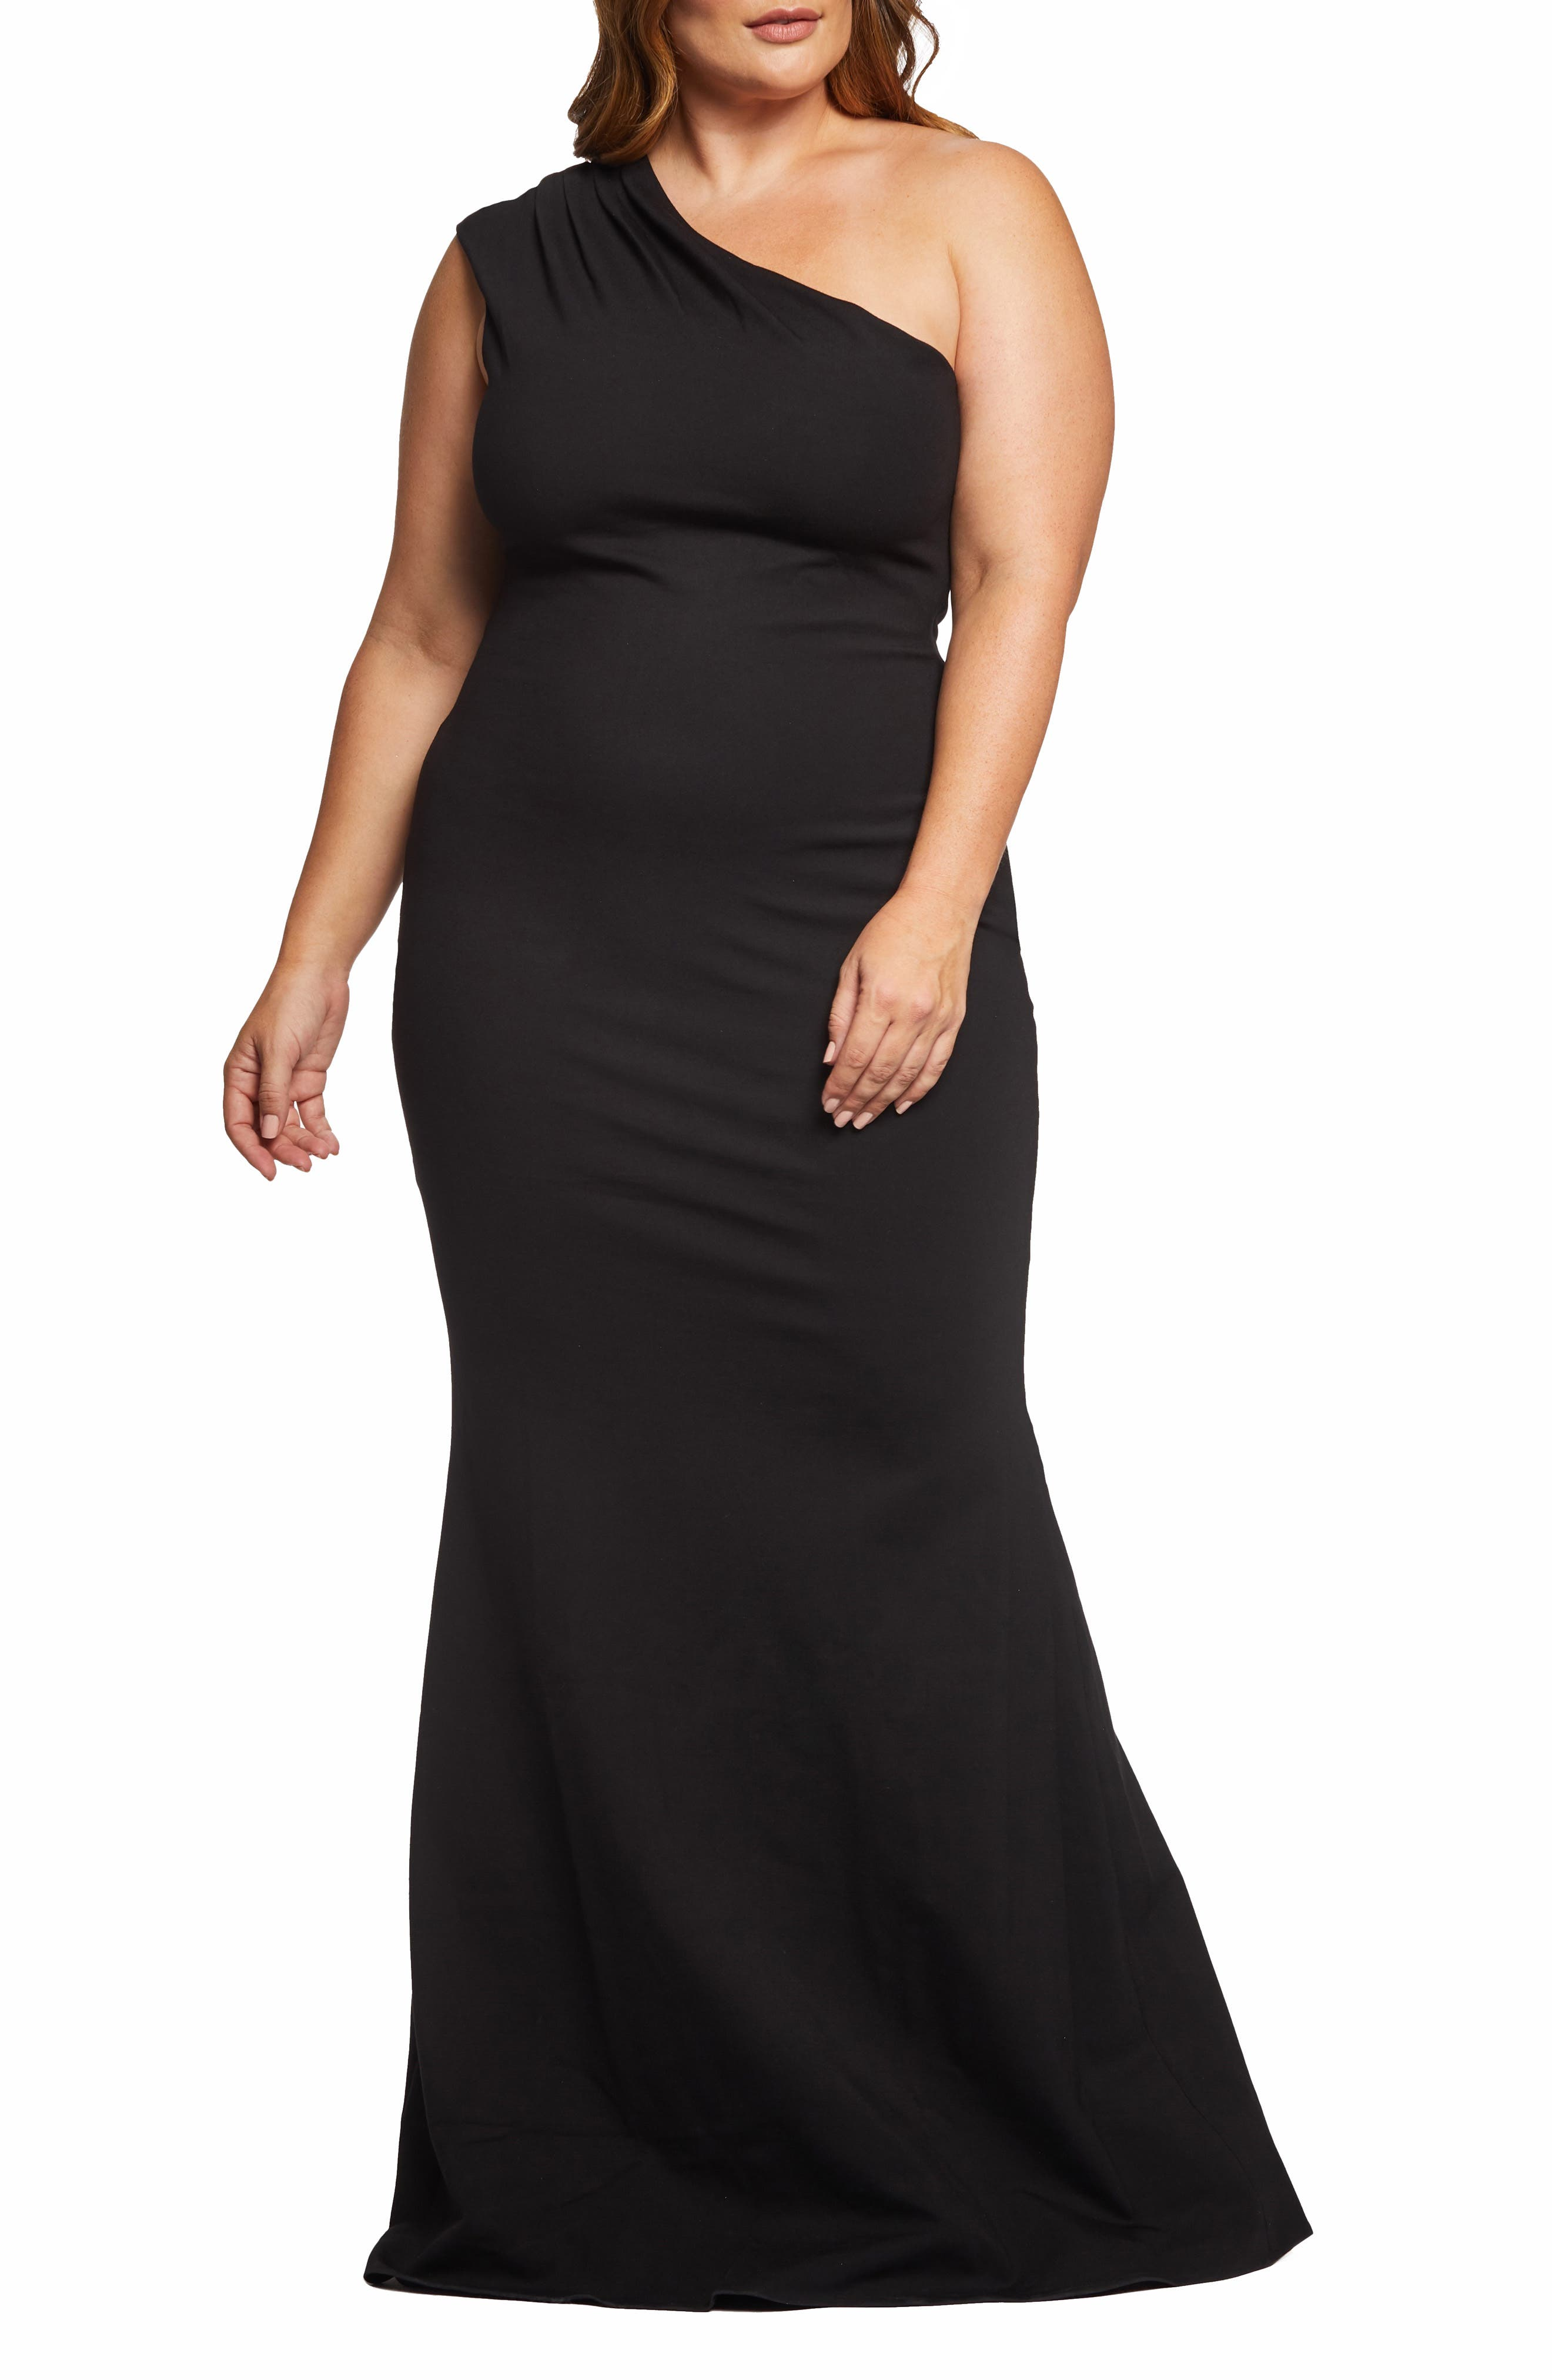 One Arm Dresses